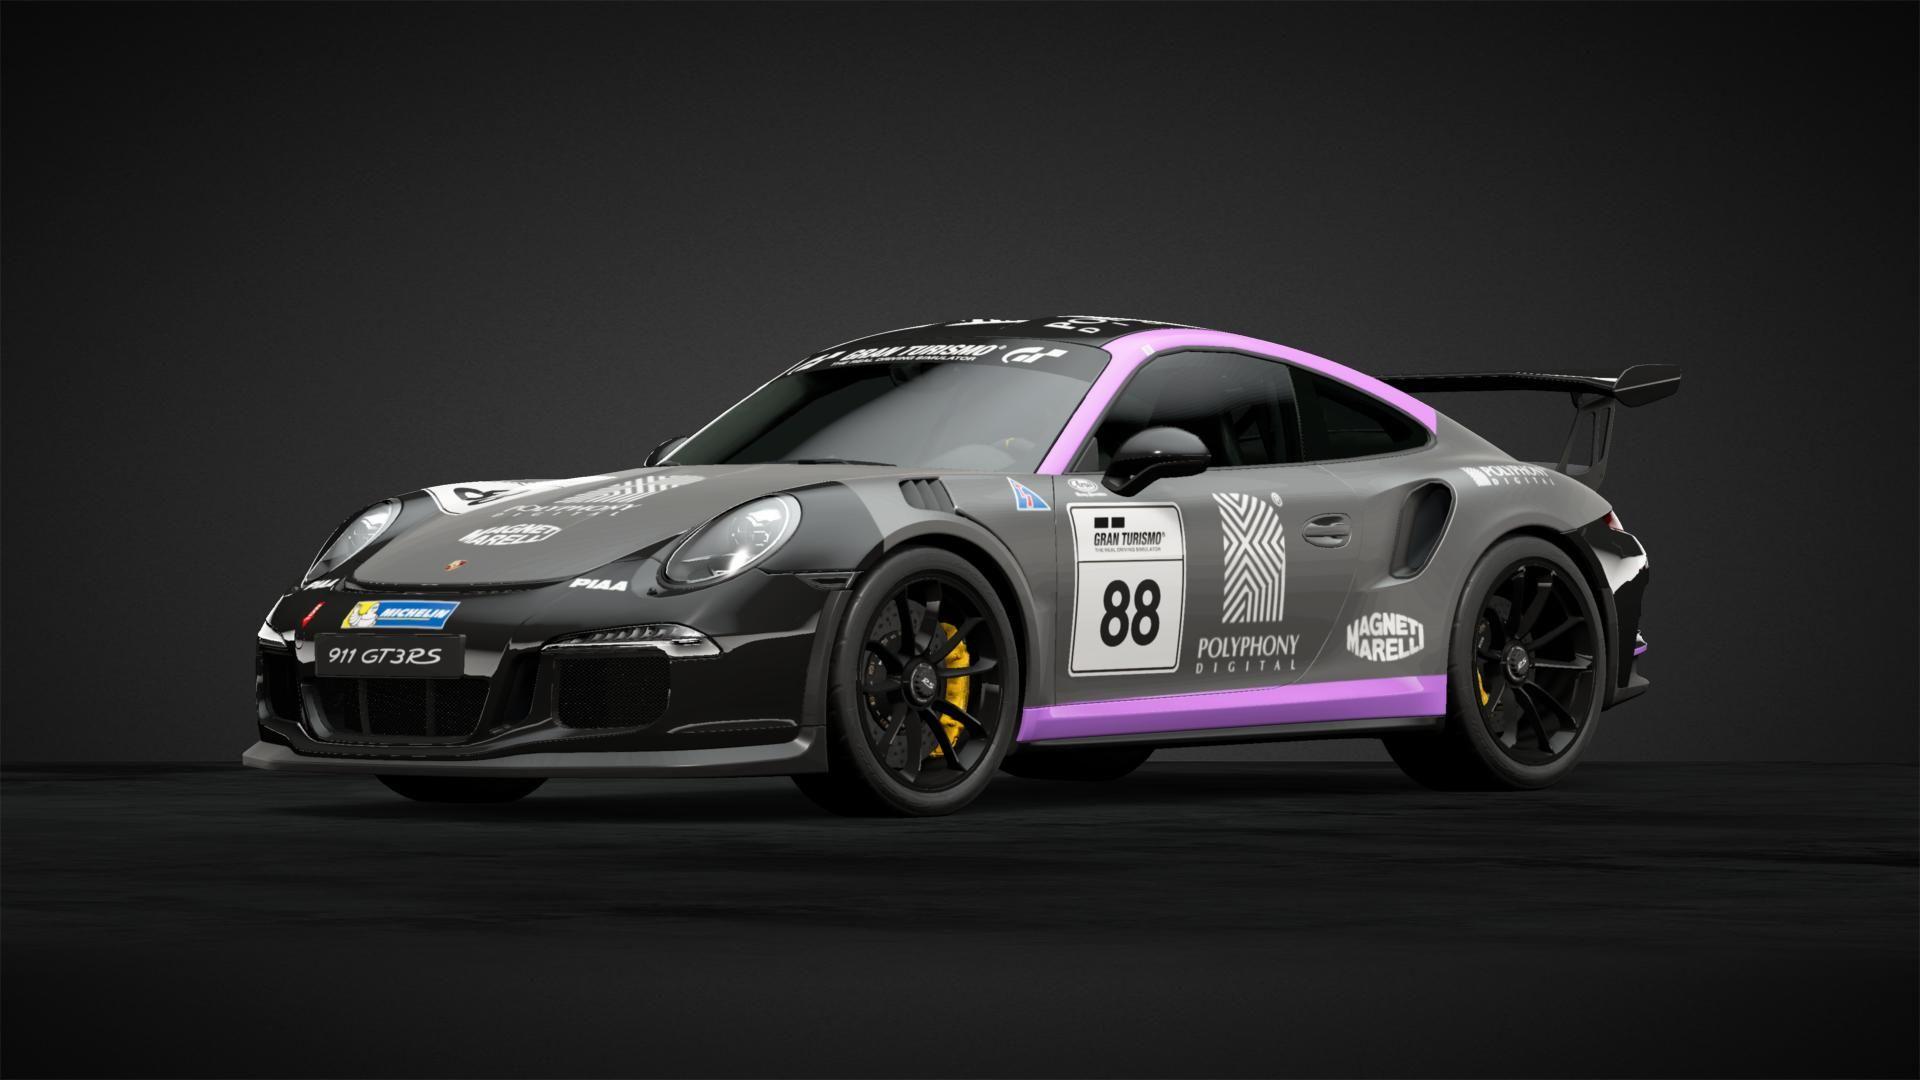 Porsche GT3 RS 991 Livery Design for Gran Turismo's GT